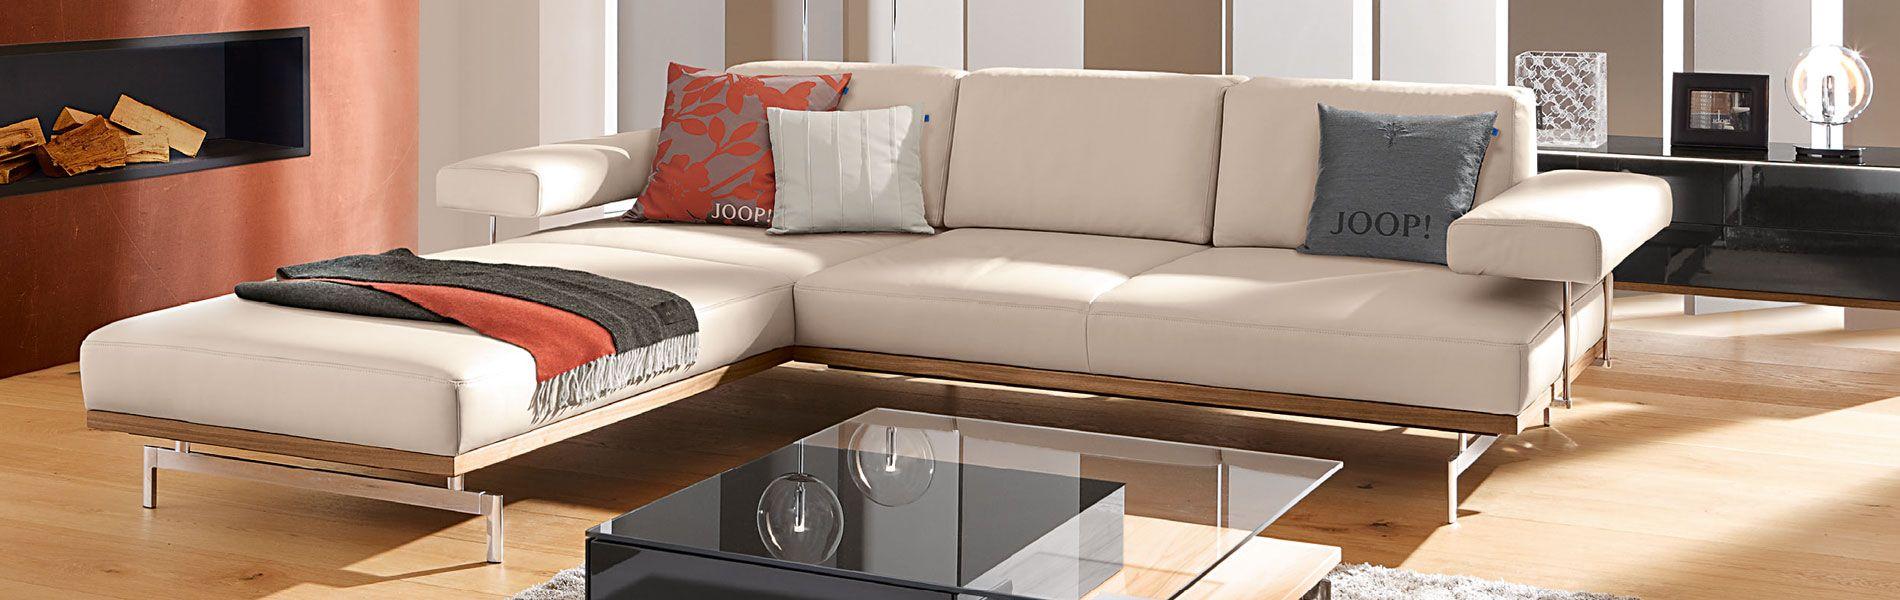 Joop Mobel Zu Unschlagbaren Preisen Bei Mobel Hoffner Couch